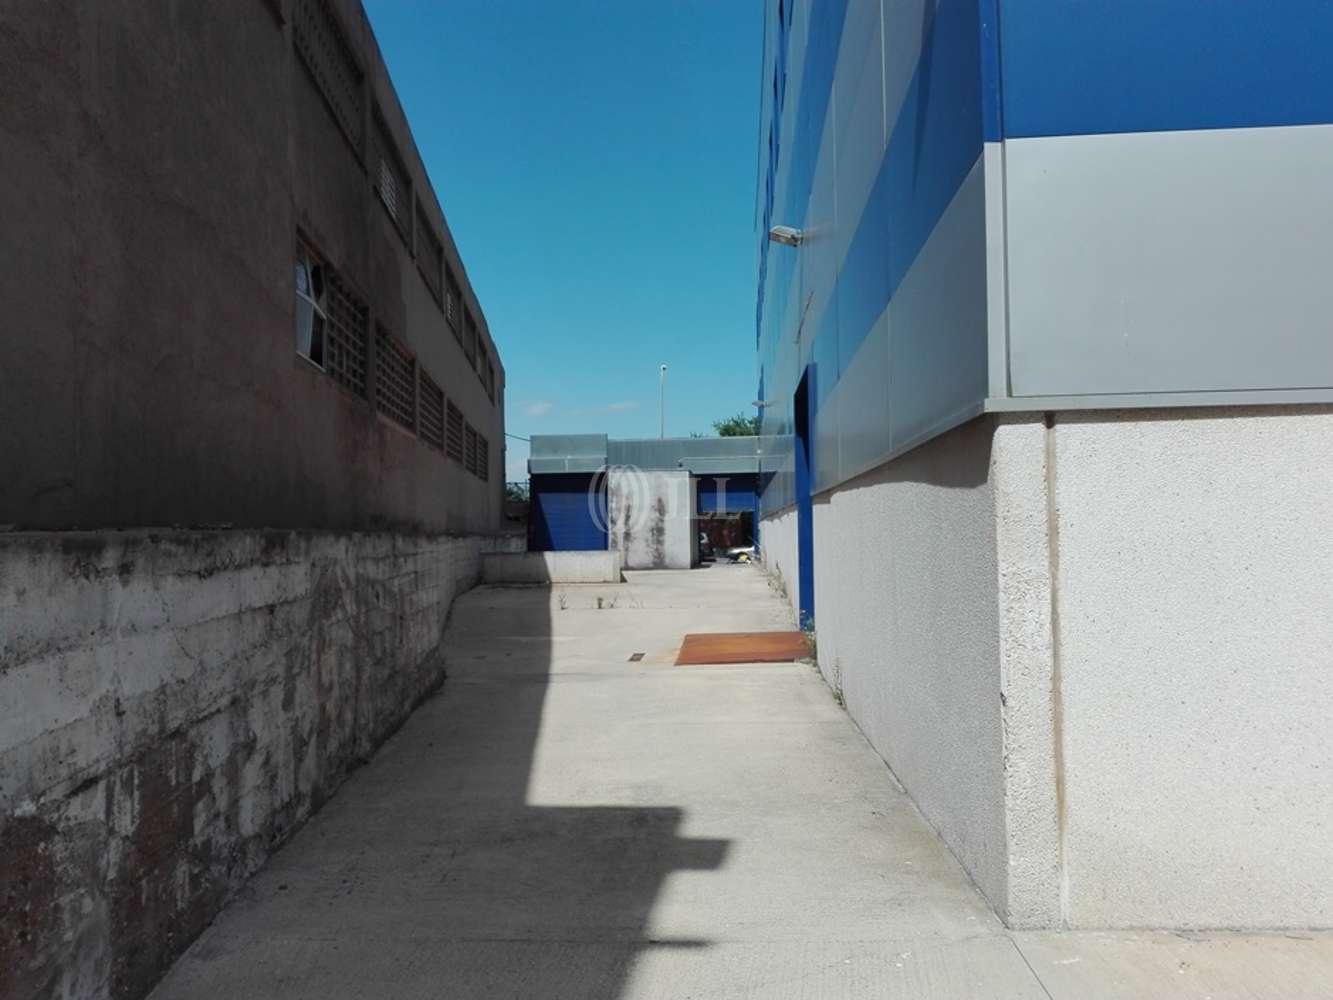 Naves industriales y logísticas Sant boi de llobregat, 08830 - Nave Industrial - B0338 - PI FONOLLAR NORD - 6225